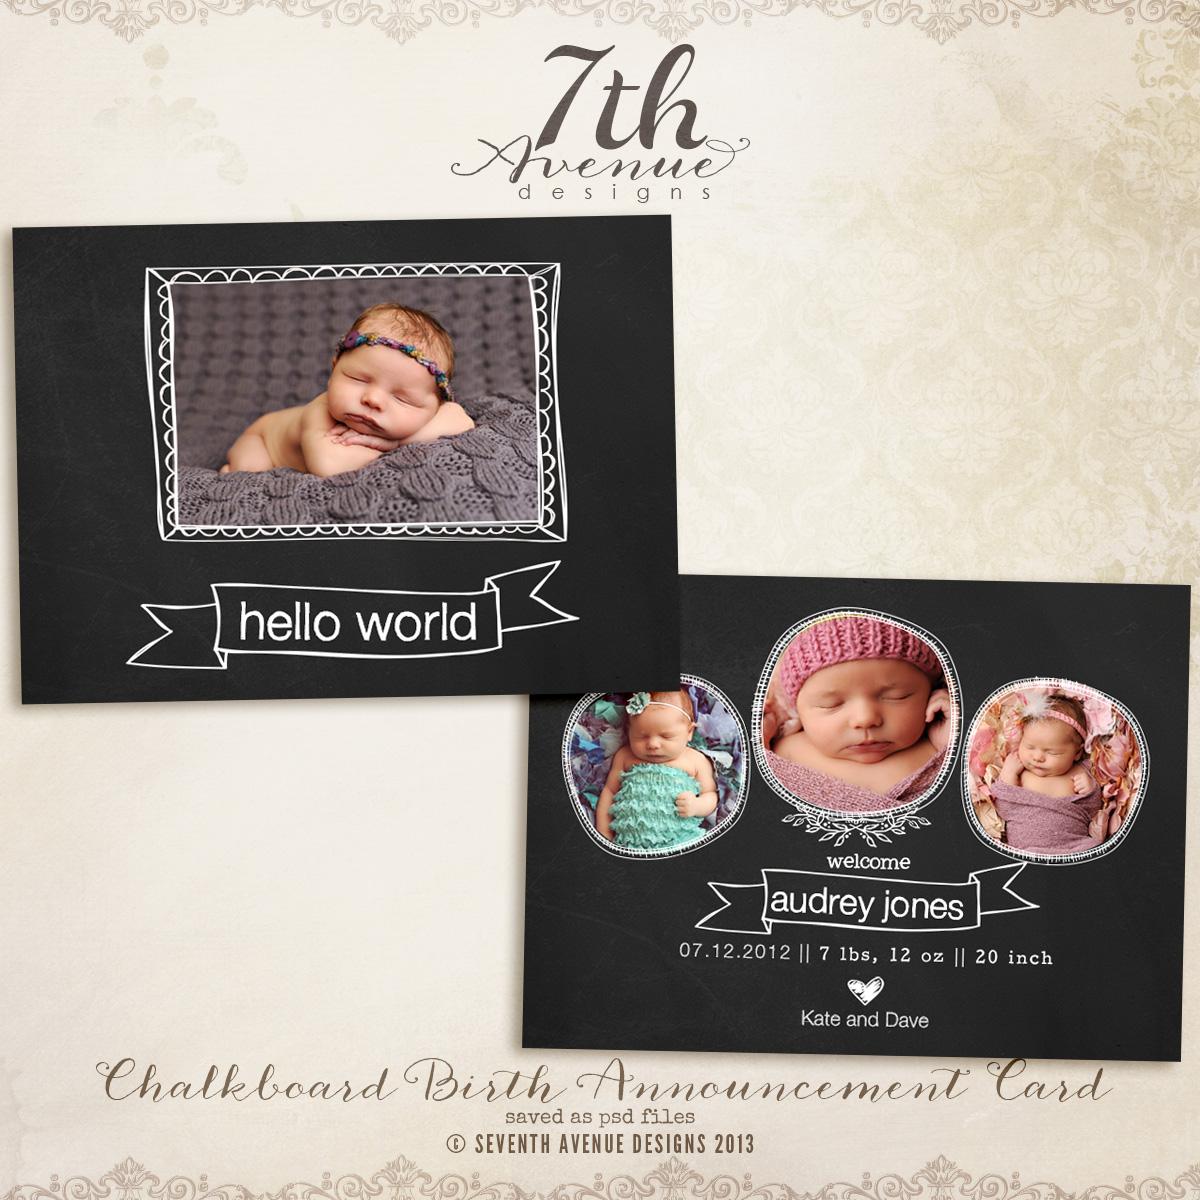 Chalkboard Birth Announcement Card Templates cardschalkboardbac – Chalkboard Birth Announcement